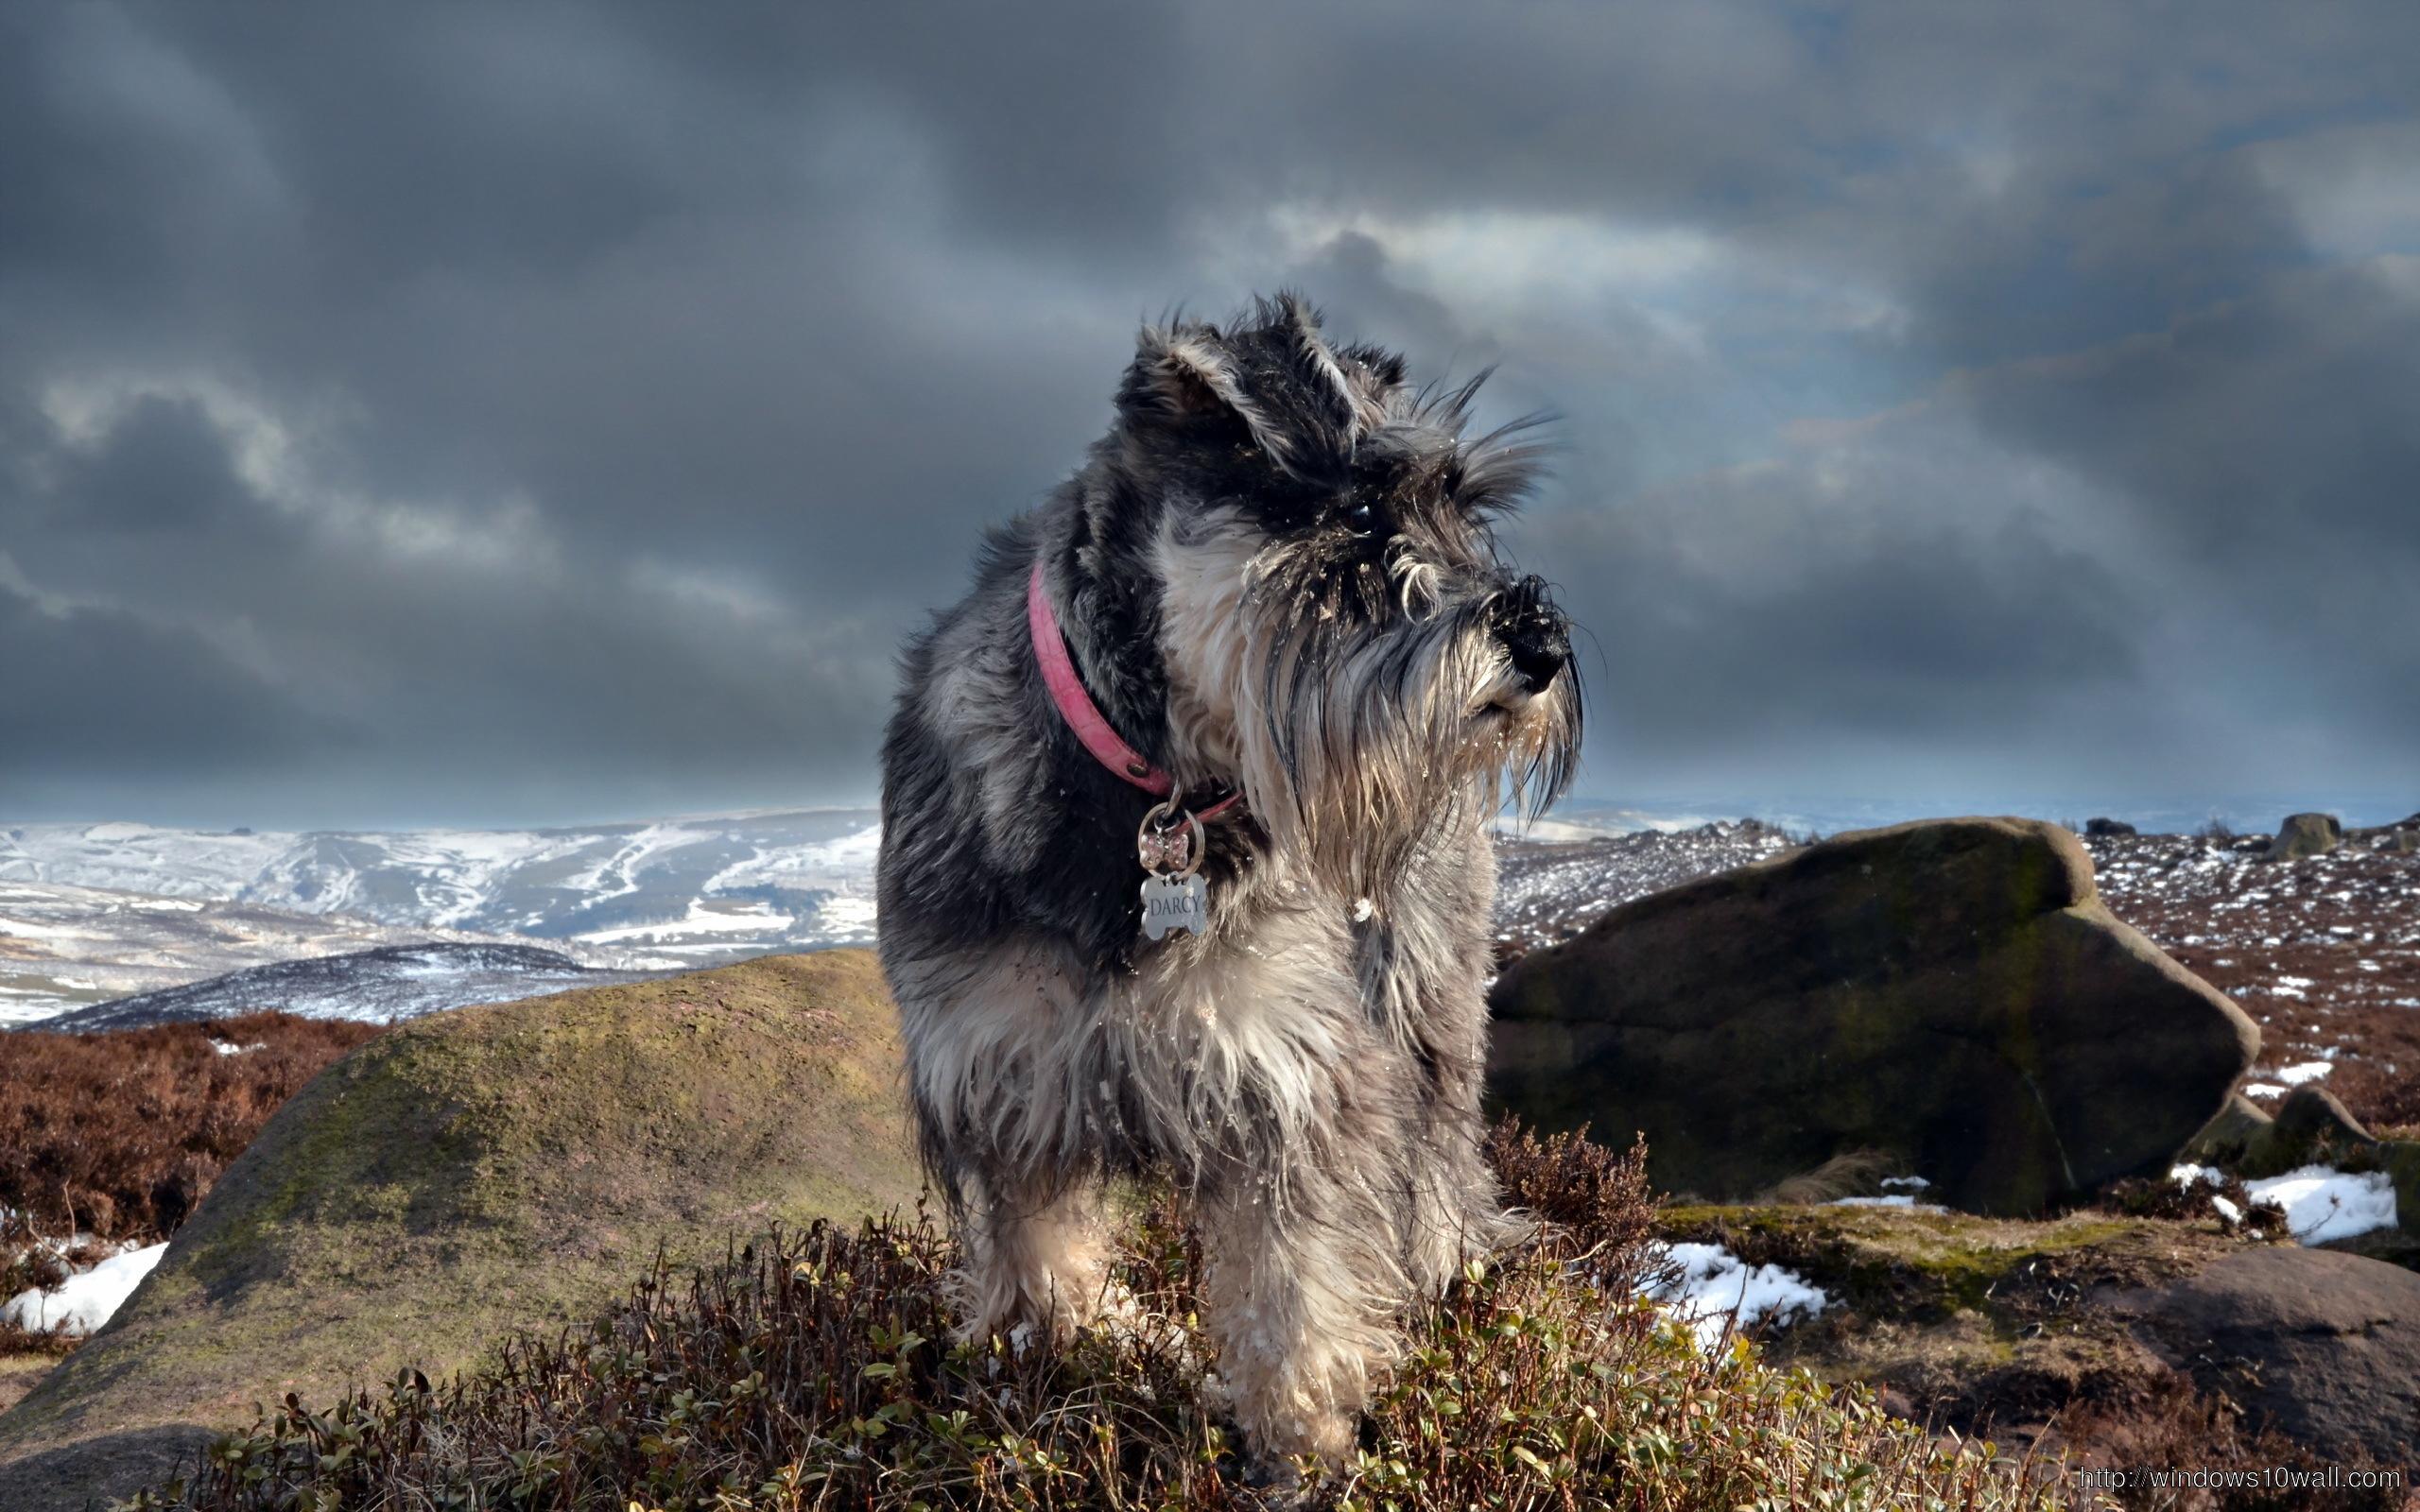 Minion Wallpaper Iphone 5 Schnauzer Dog Images Hd Background Wallpaper Windows 10